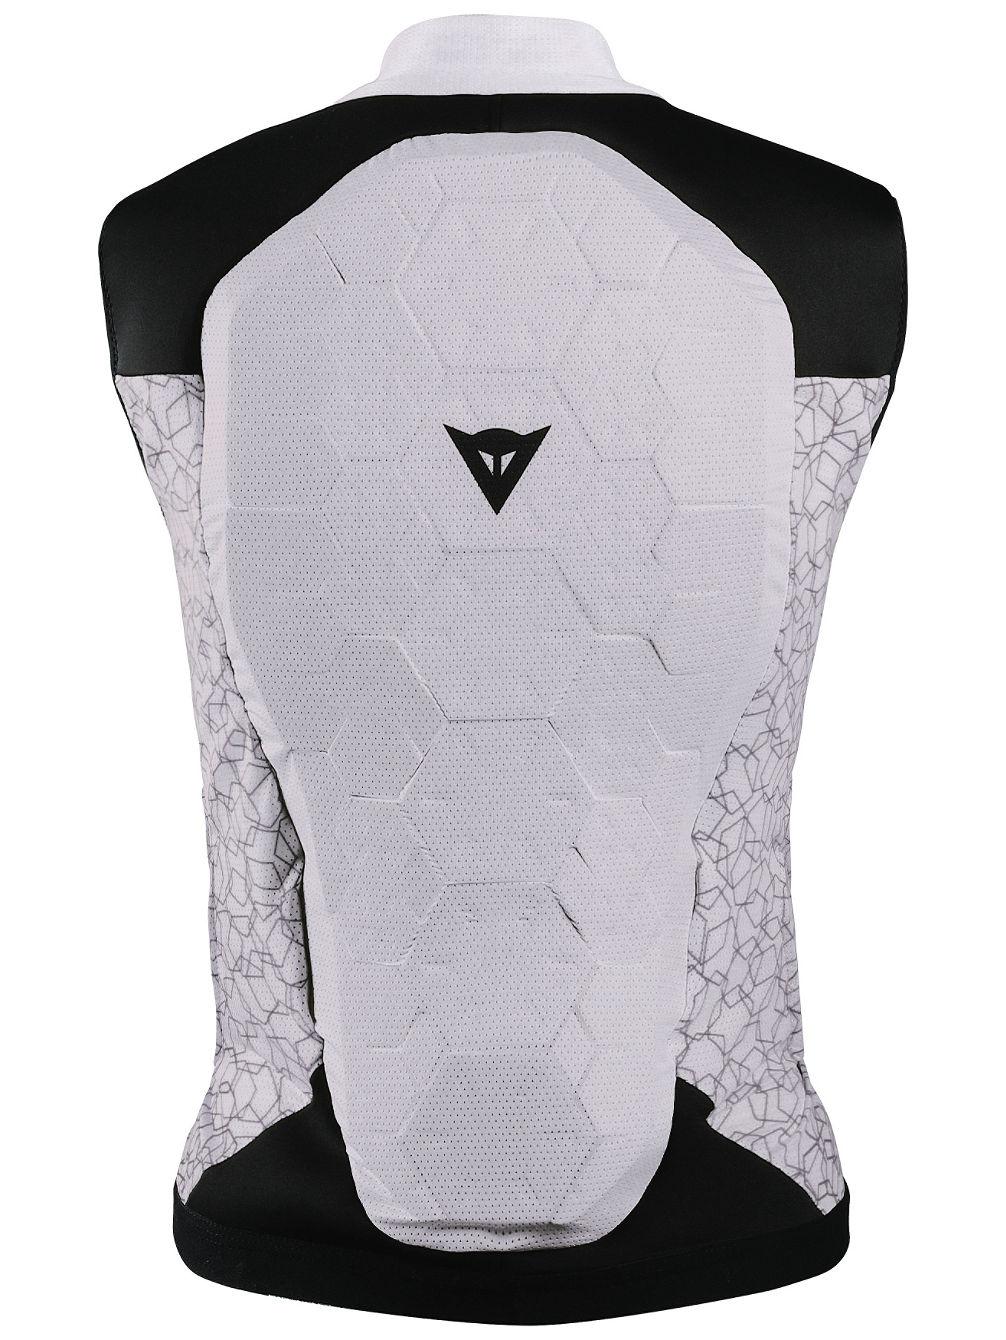 dainese flexagon waistcoat r ckenprotektor online kaufen. Black Bedroom Furniture Sets. Home Design Ideas